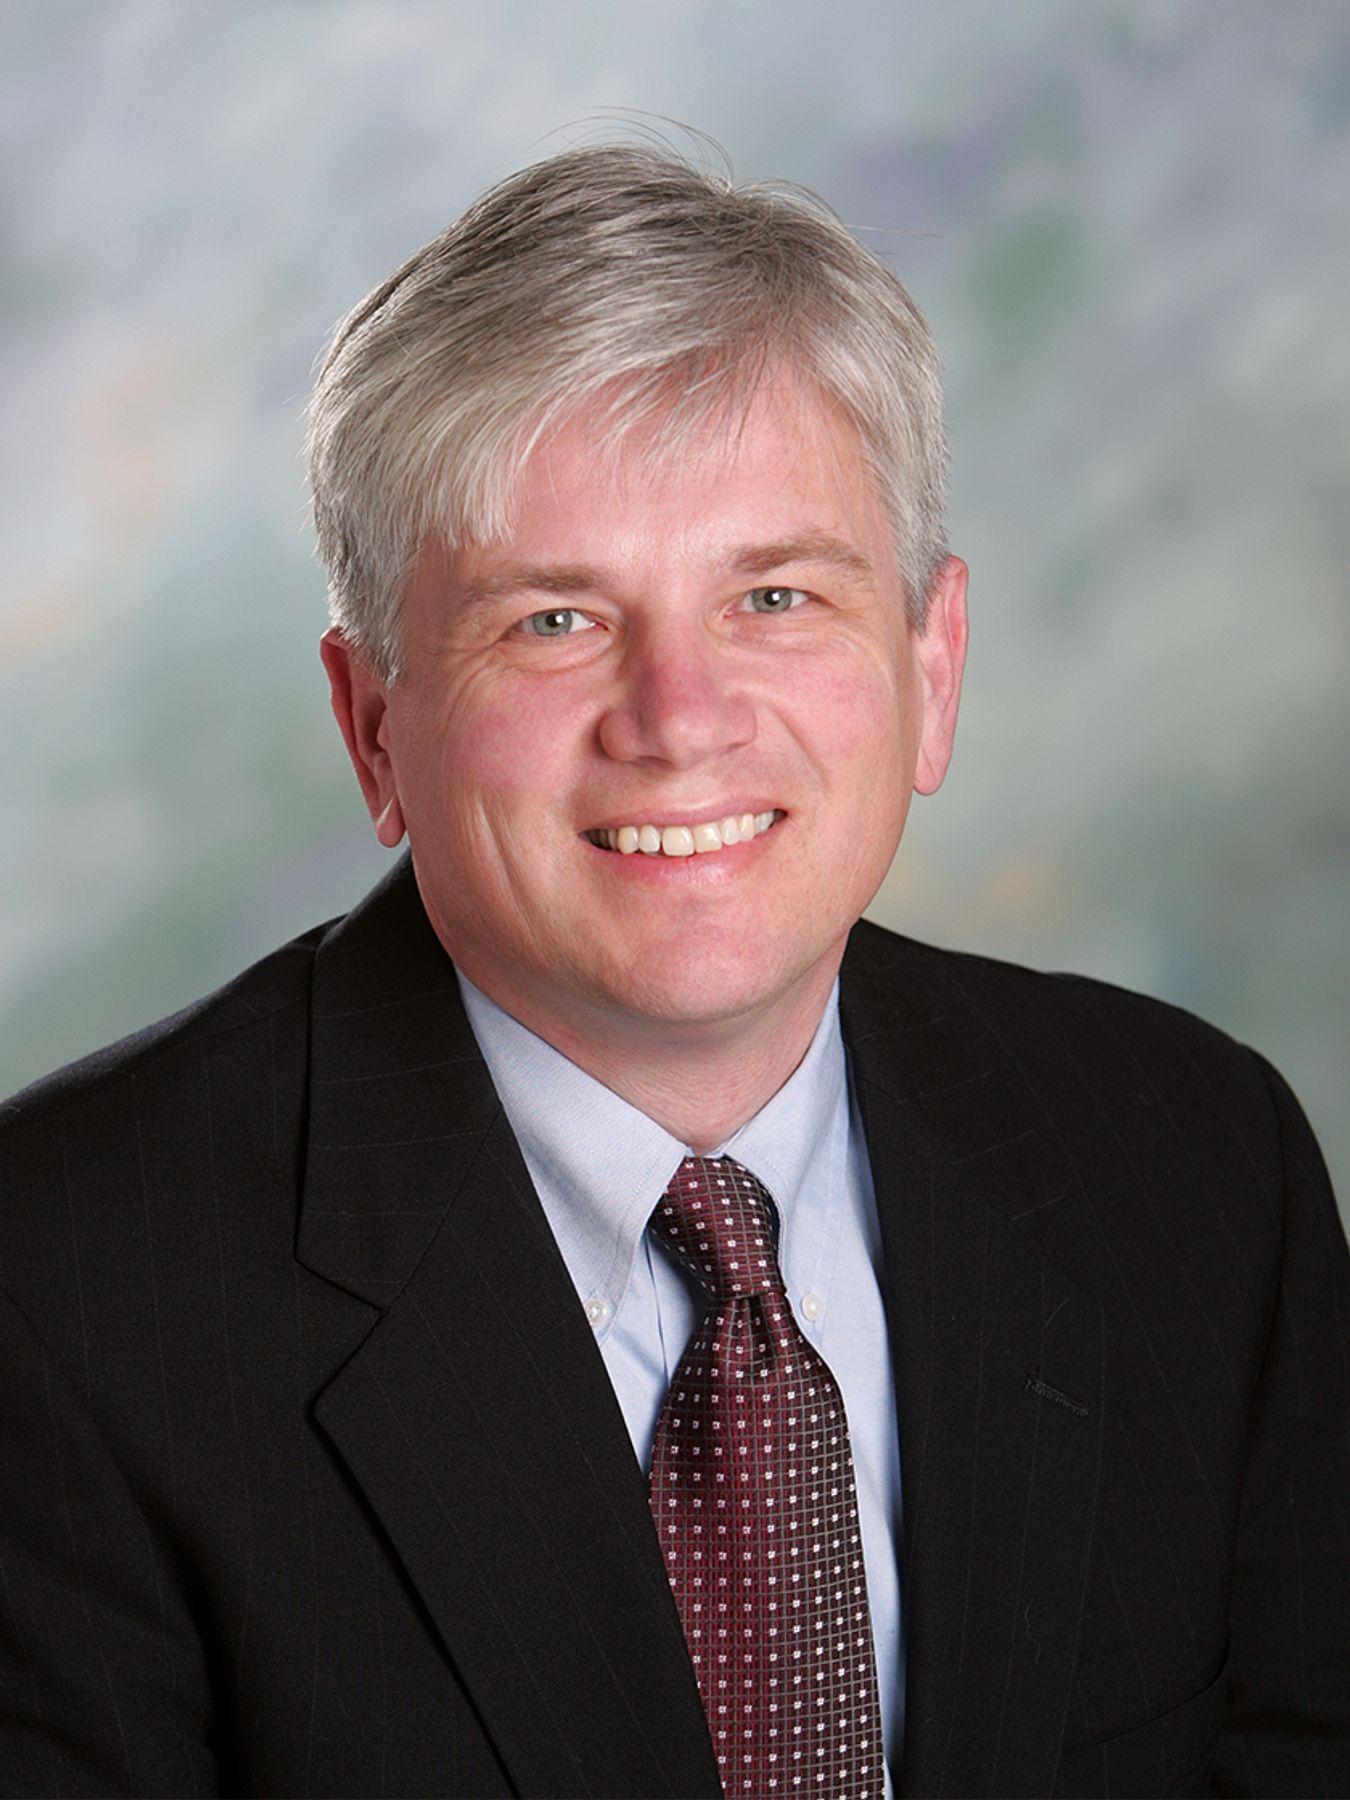 Stephen Cobb